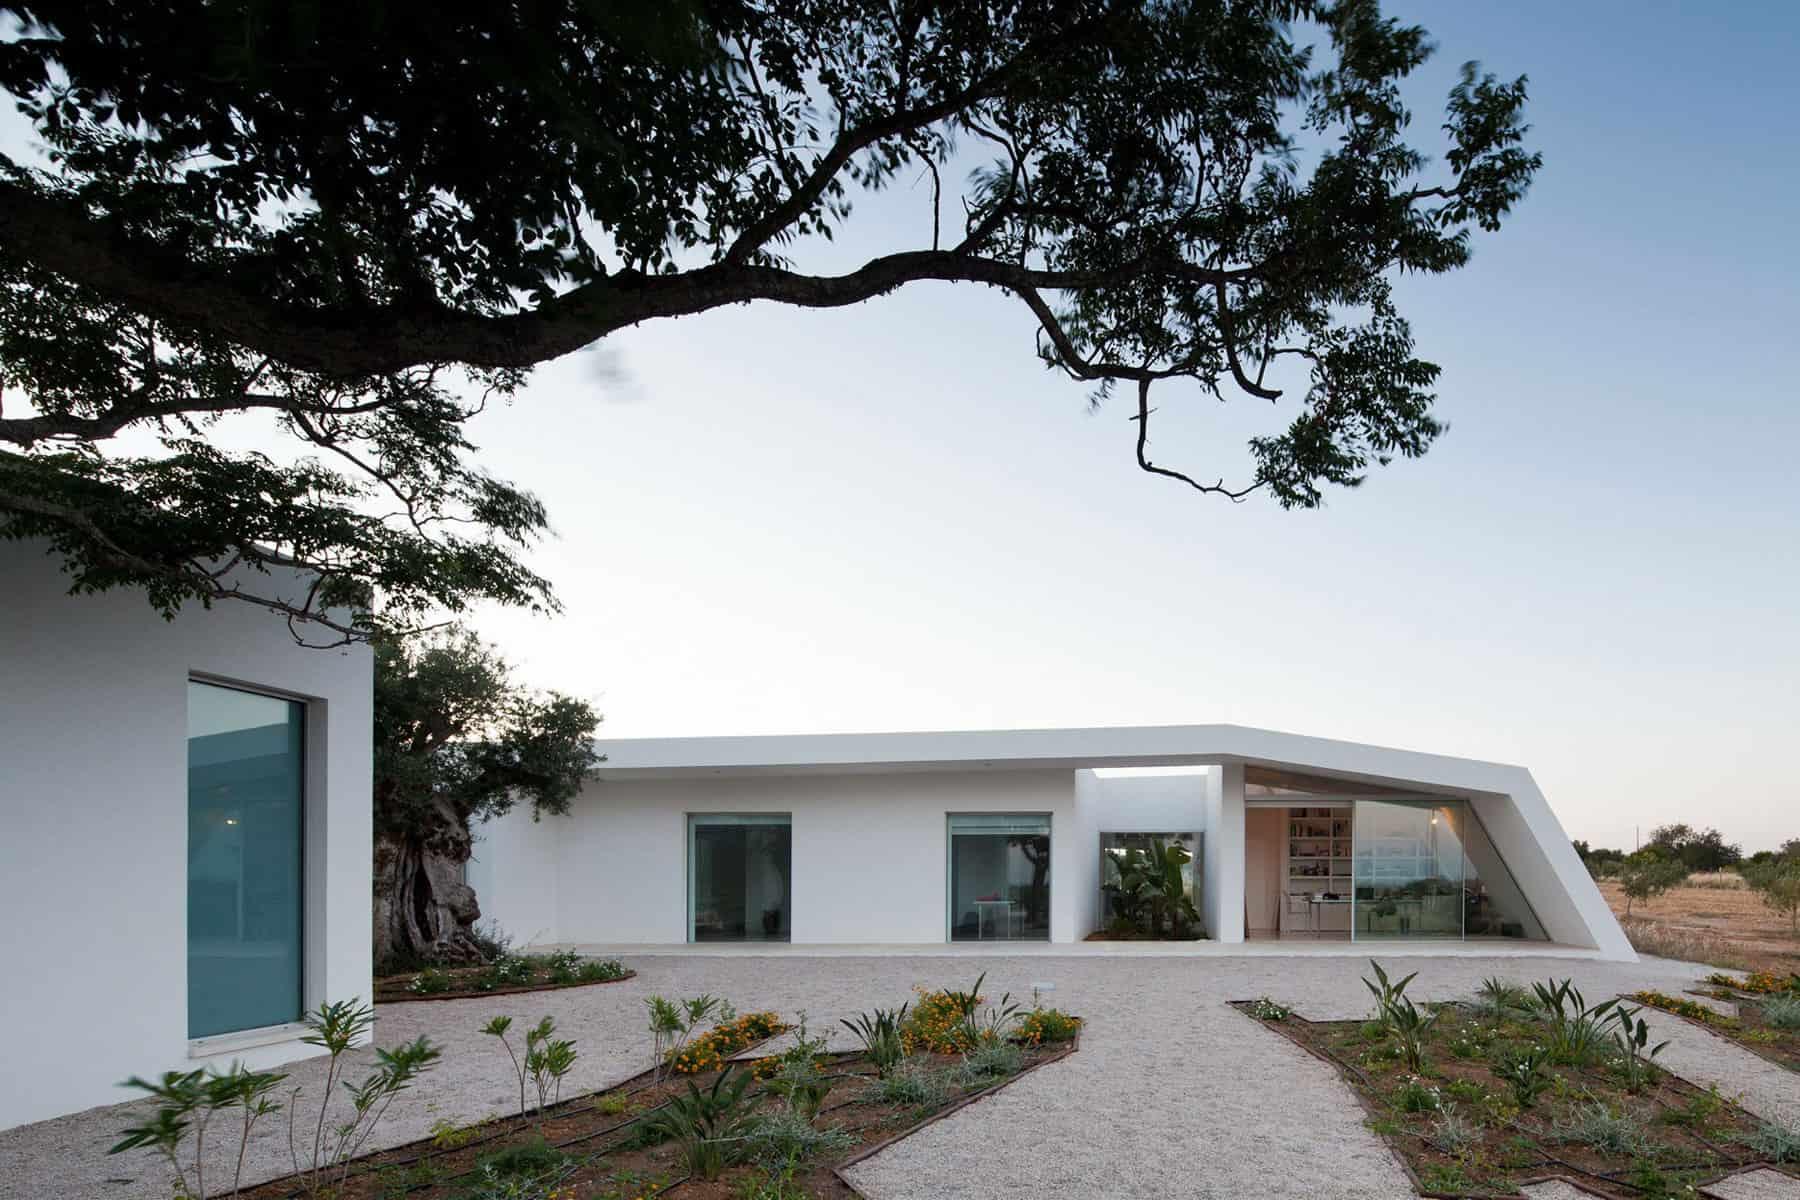 House in Tavira by Vitor Vilhena Architects (2)